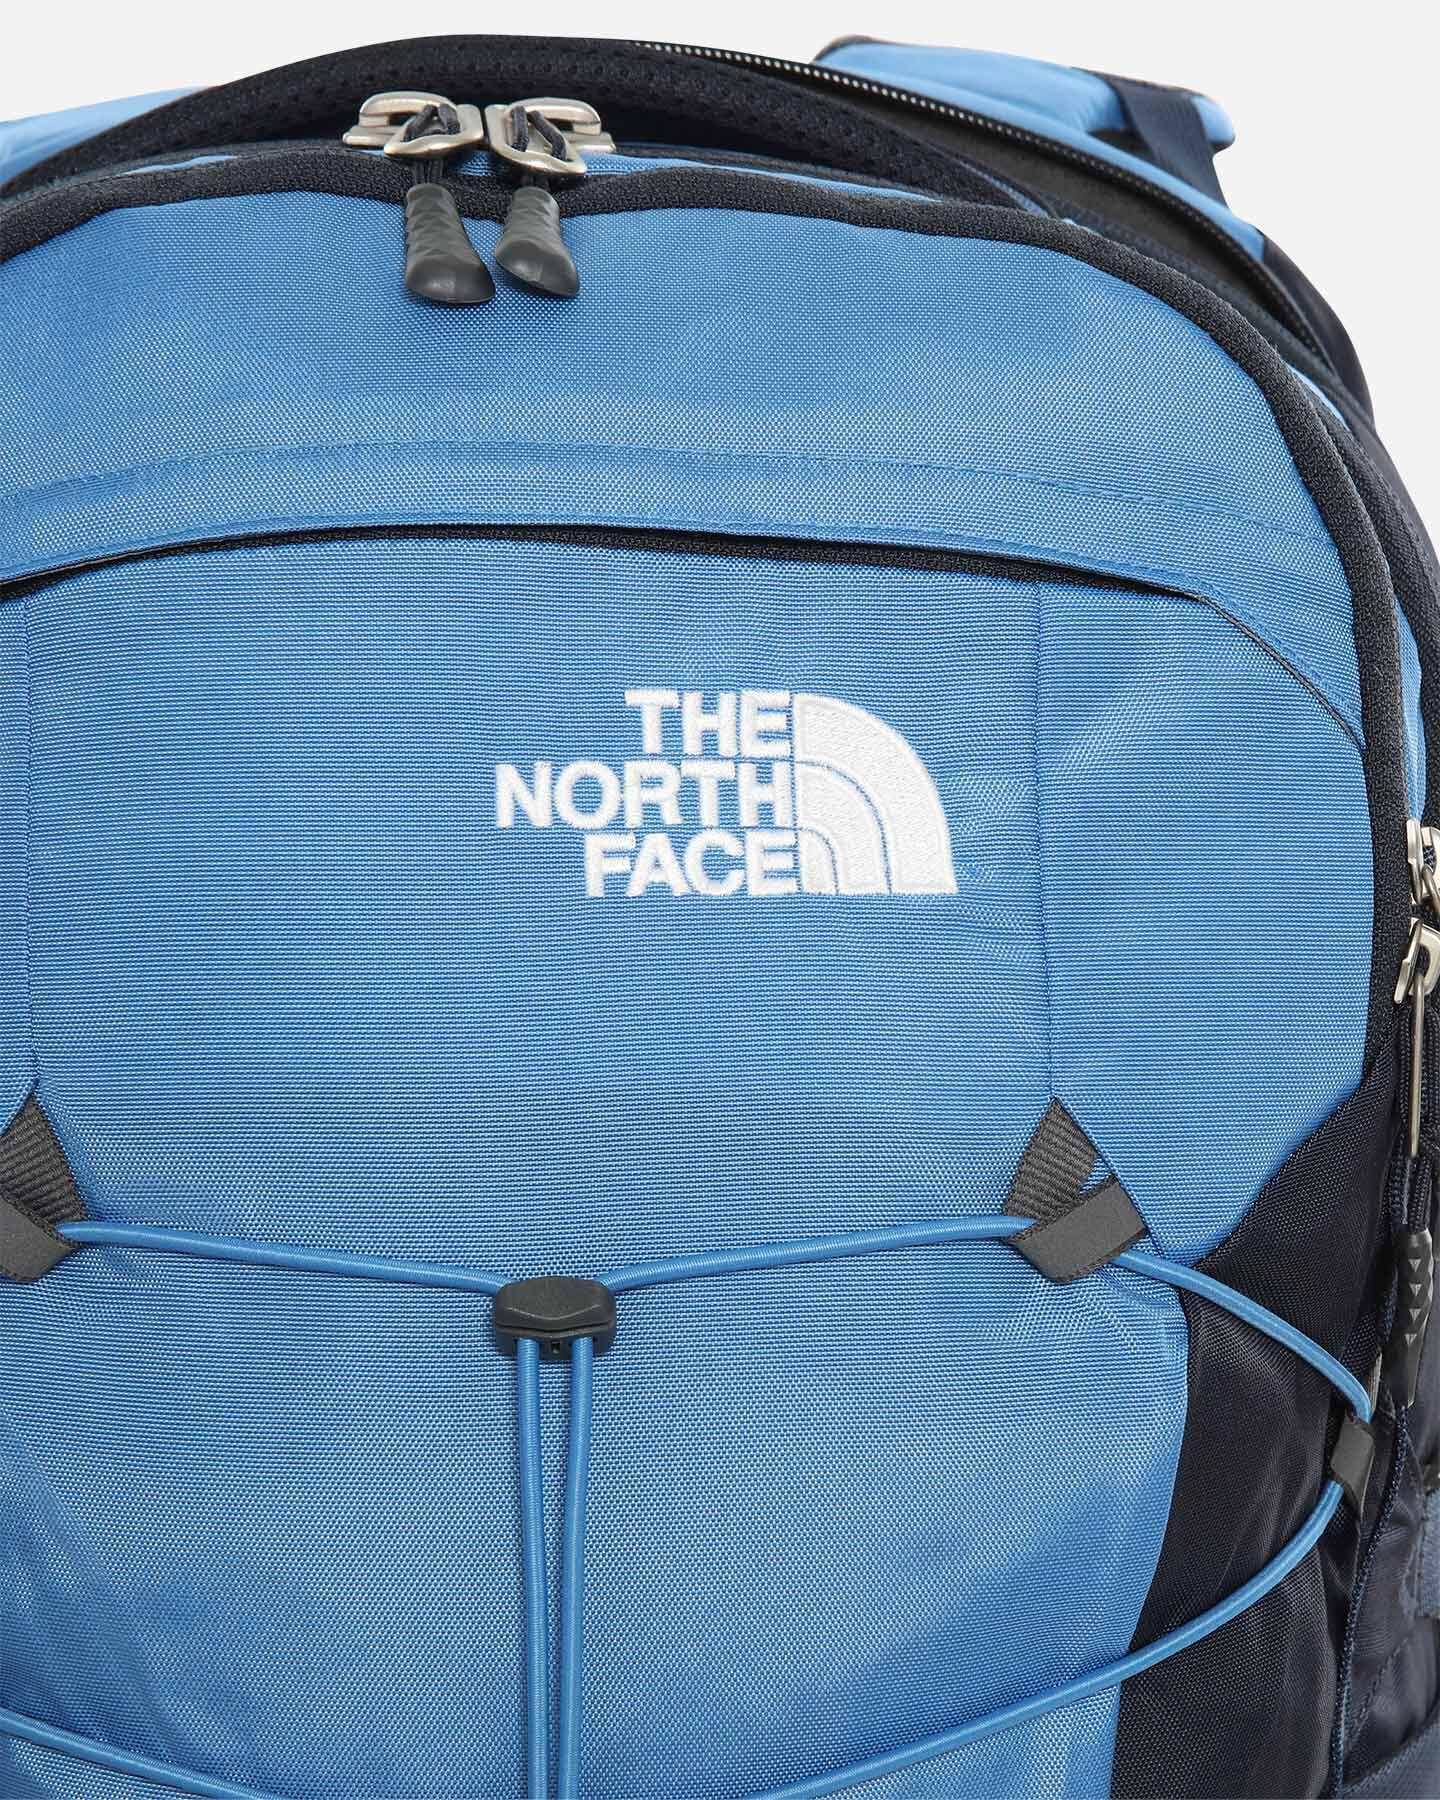 Zaino THE NORTH FACE BOREALIS S5202226|PN1|OS scatto 5